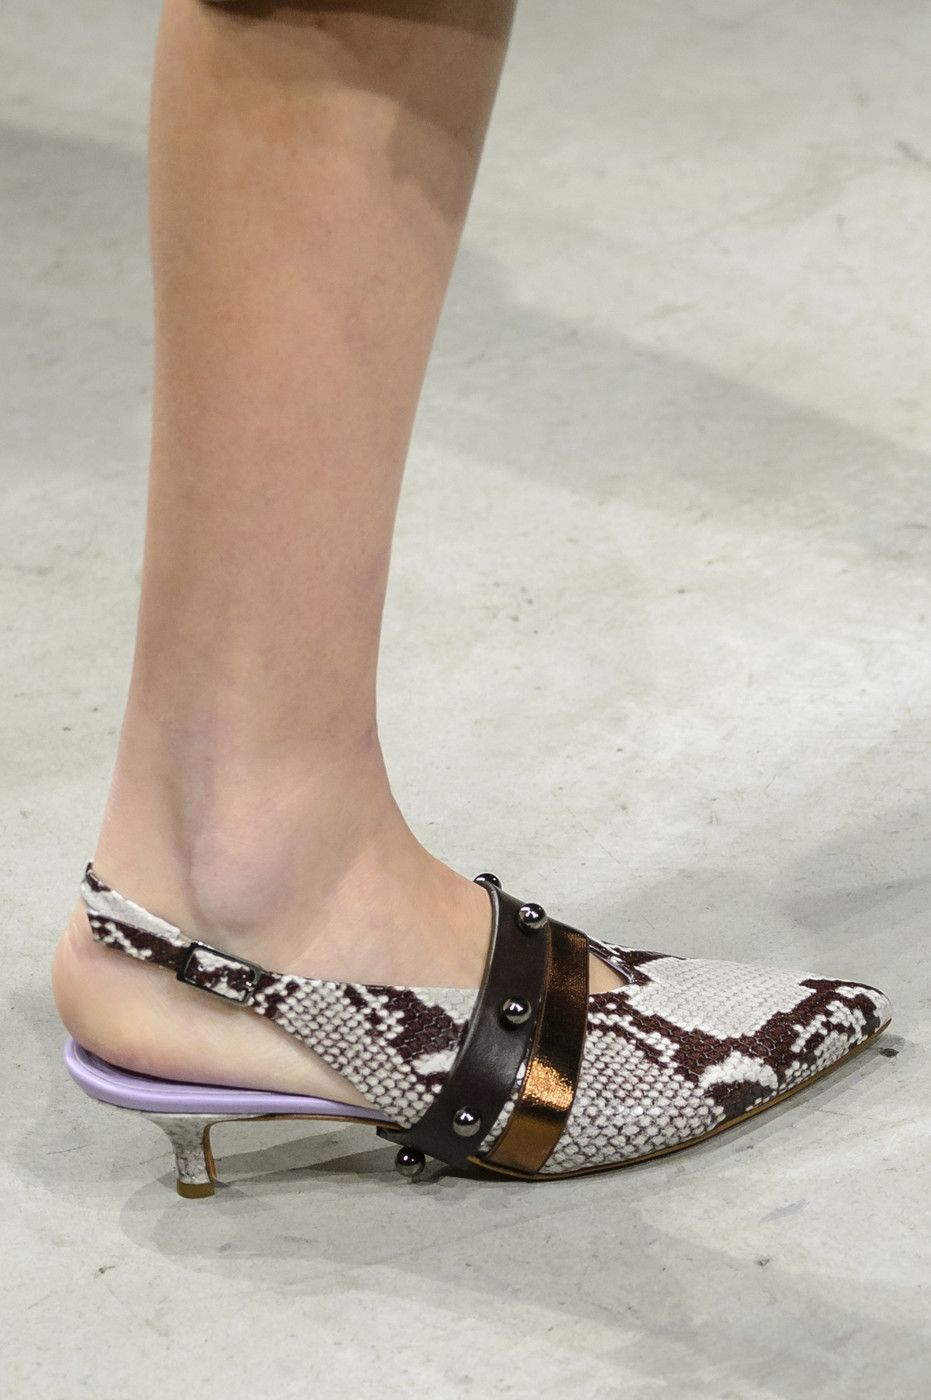 Cividini At Milan Fashion Week Spring 2018 Photo Livingly Com Kitten Heel Shoes Funky Shoes Designer Shoes